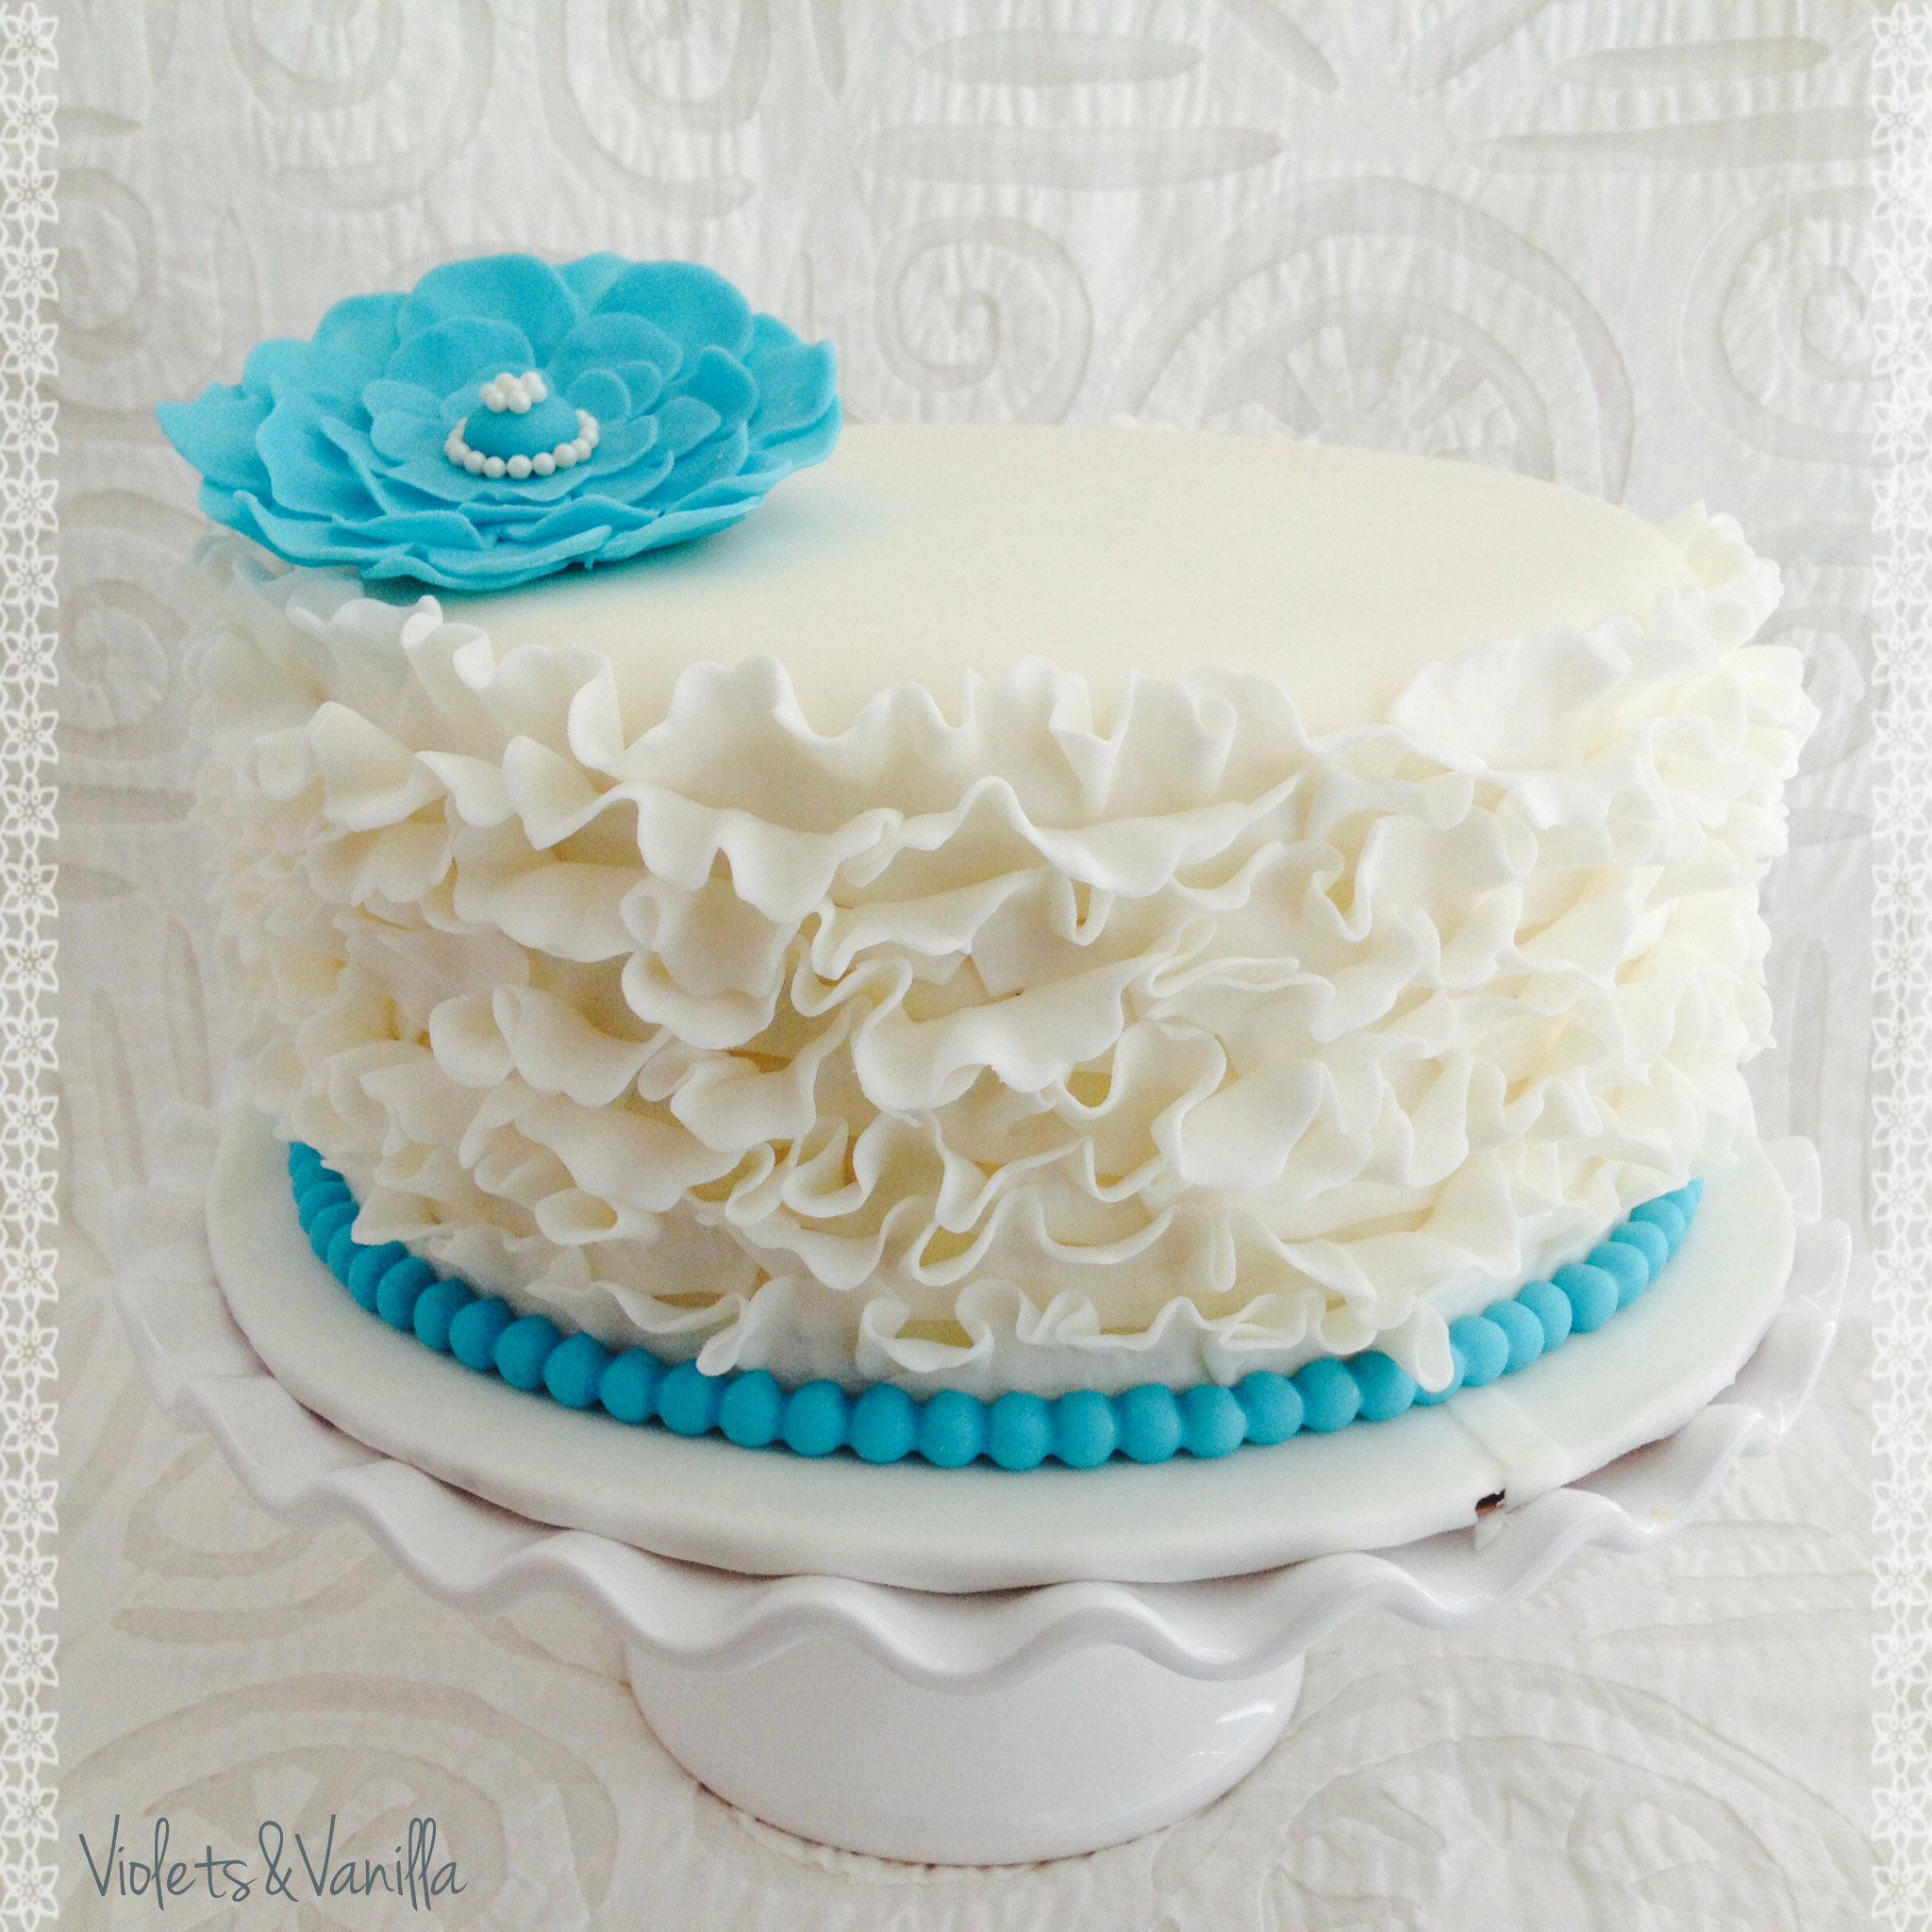 Blue And White Fondant Ruffle Cake Violets Vanilla